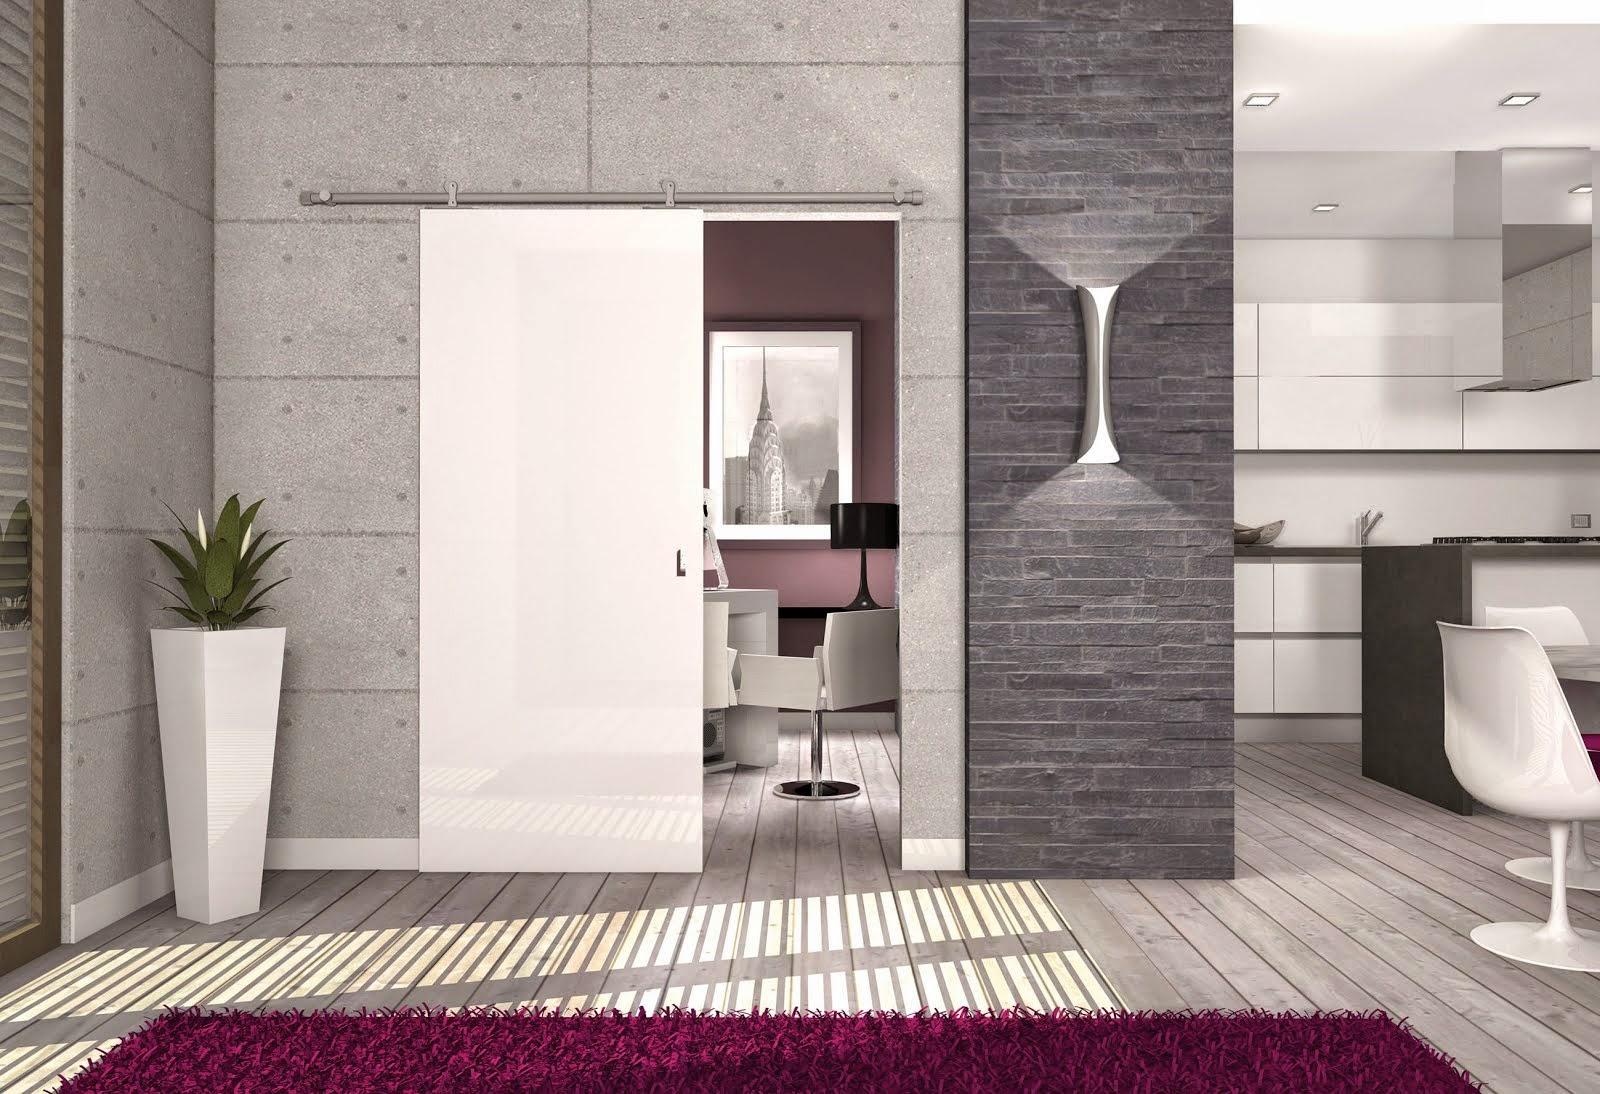 Arredo e design protek presenta gli scorrevoli esterno muro - Porte scorrevoli esterno muro ...